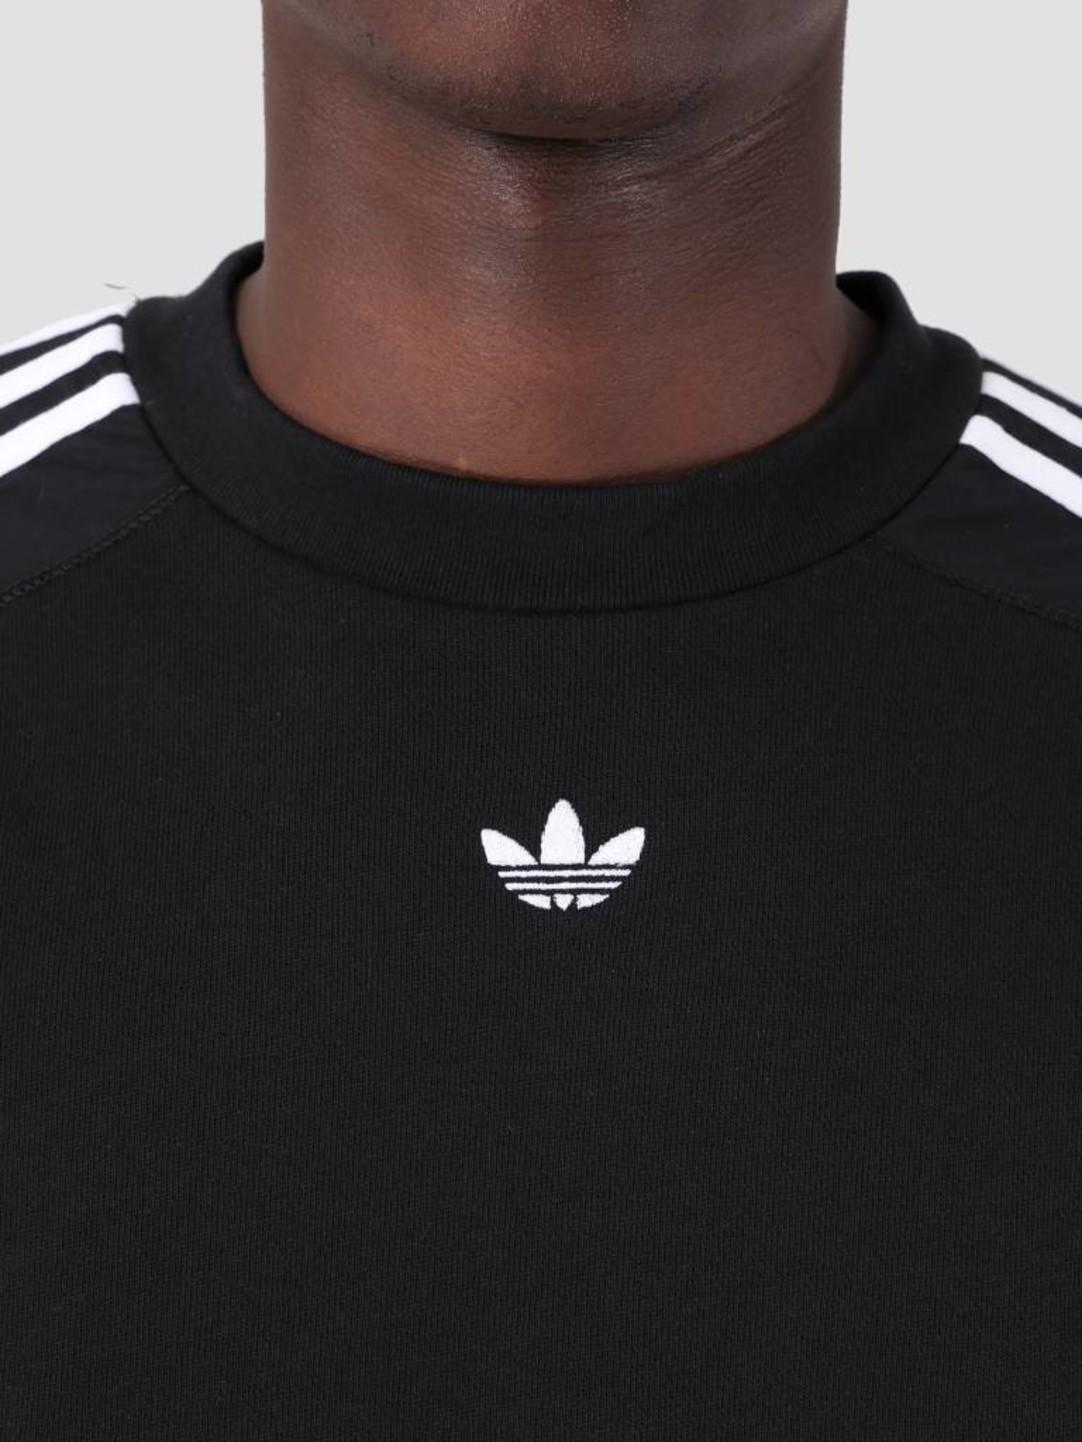 adidas adidas Radkin Crewneck Black DU8141